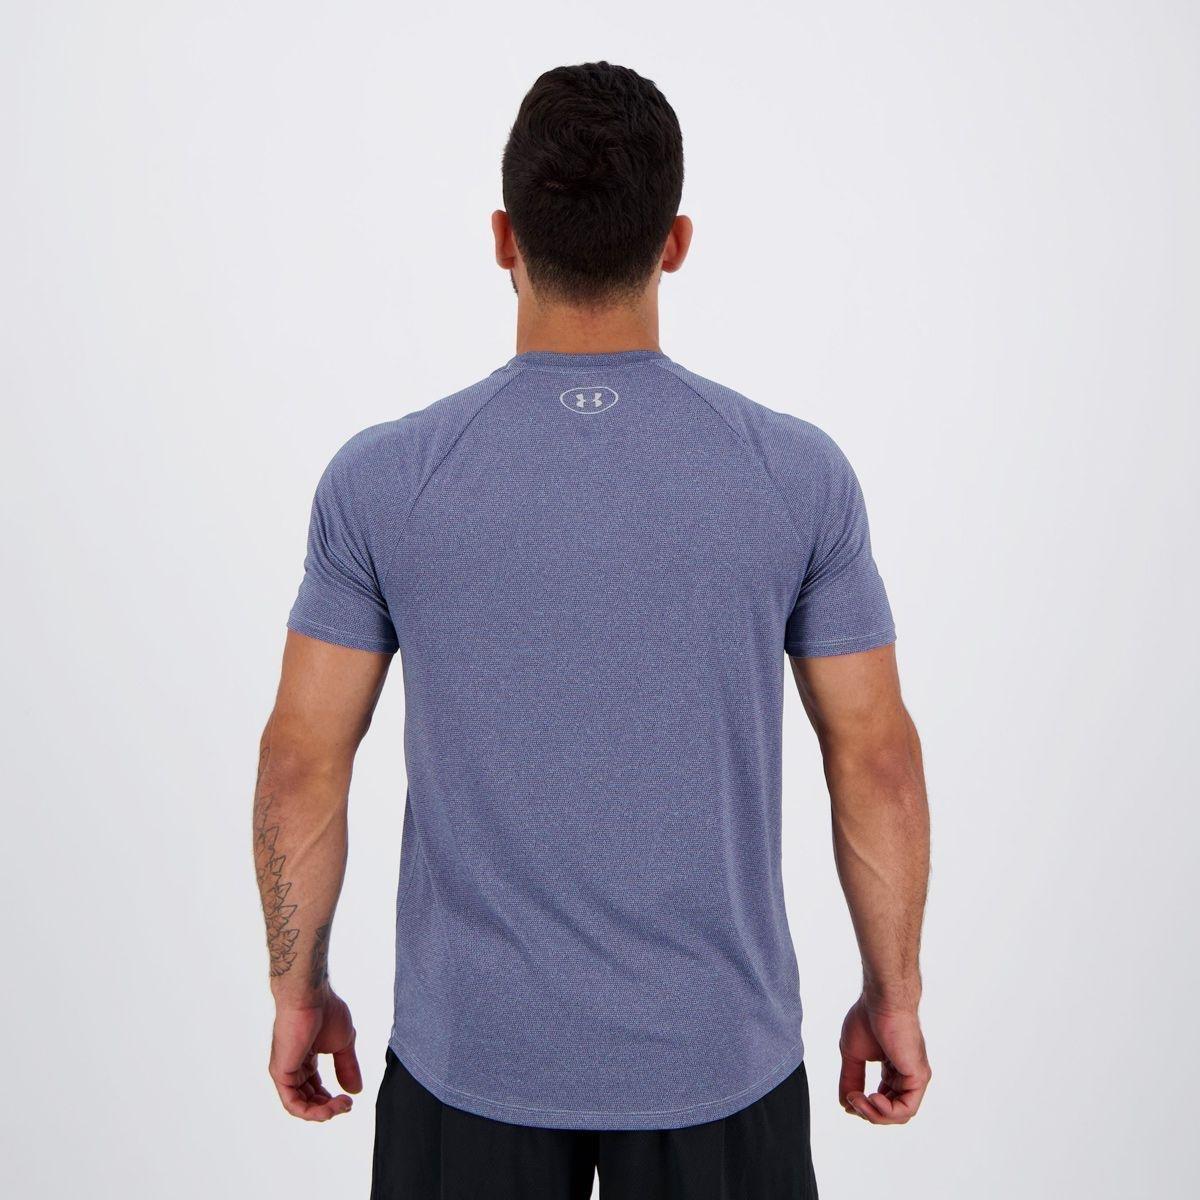 Camiseta Under Armour Tech 2.0 Tee